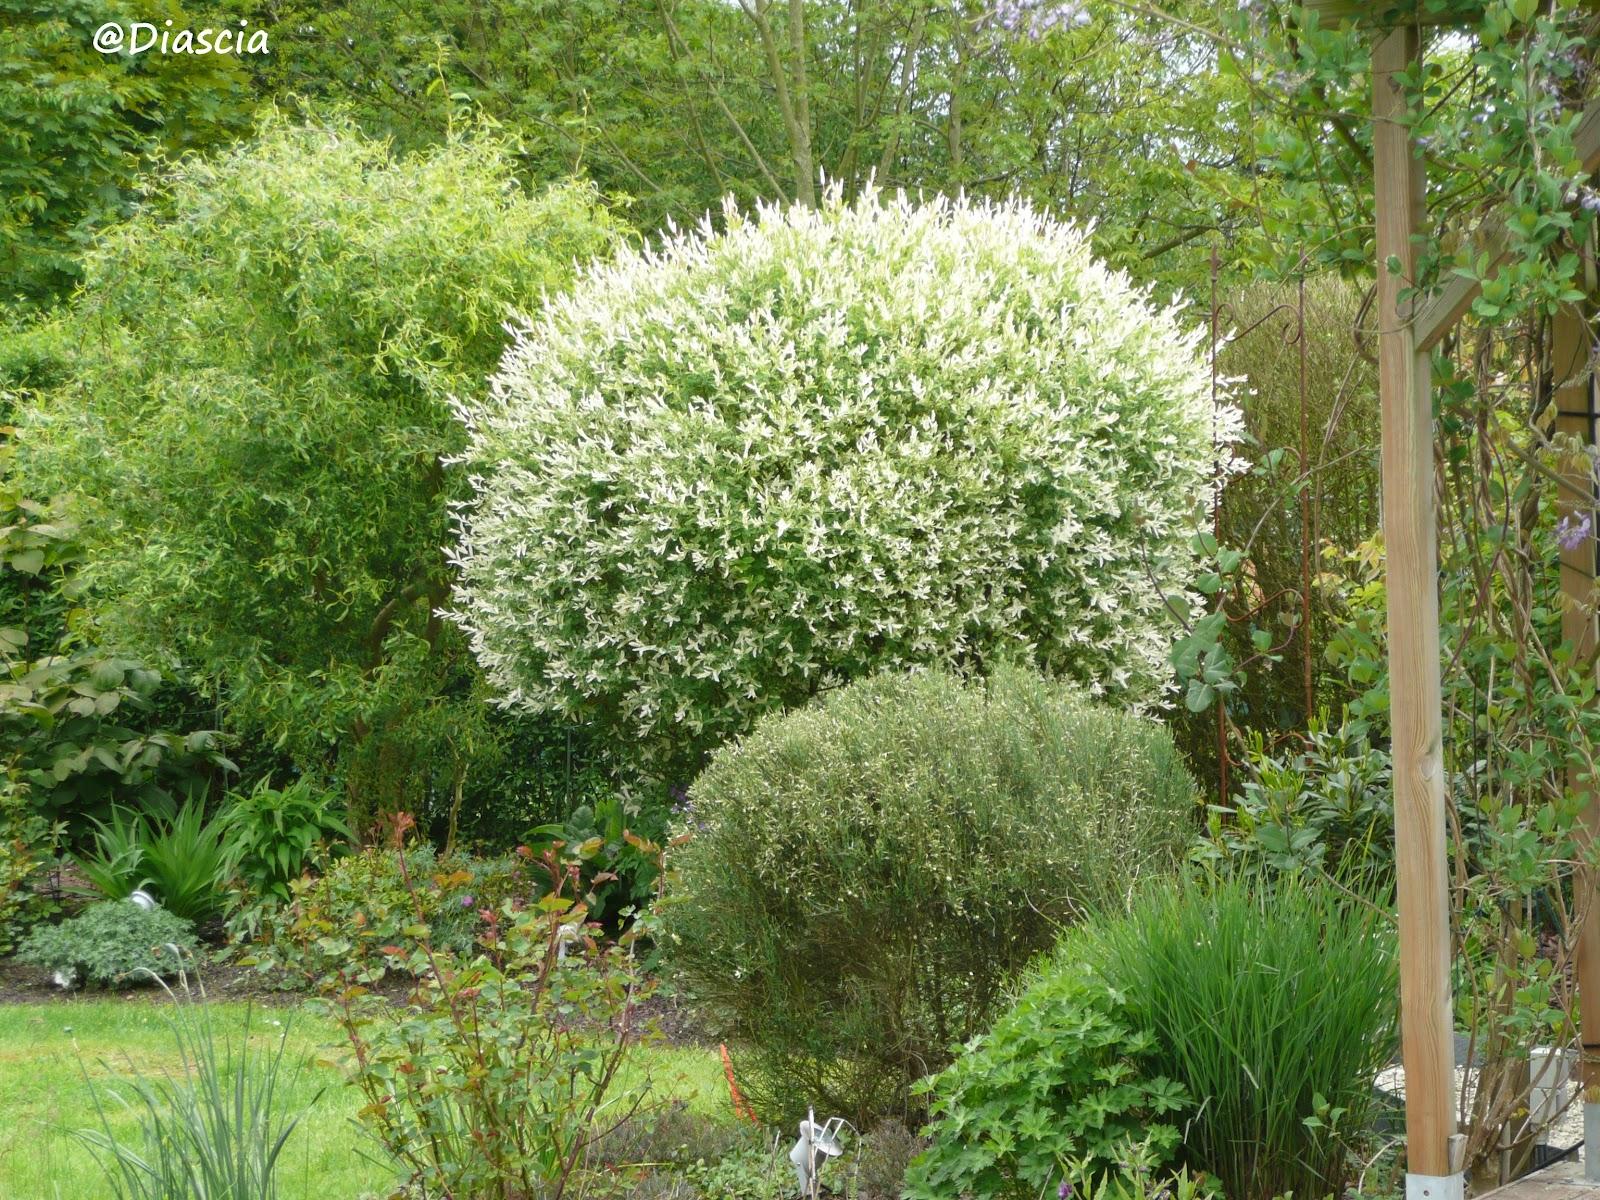 Le jardin de diascia salix integra hakuro nishiki - Salix hakuro nishiki taille ...